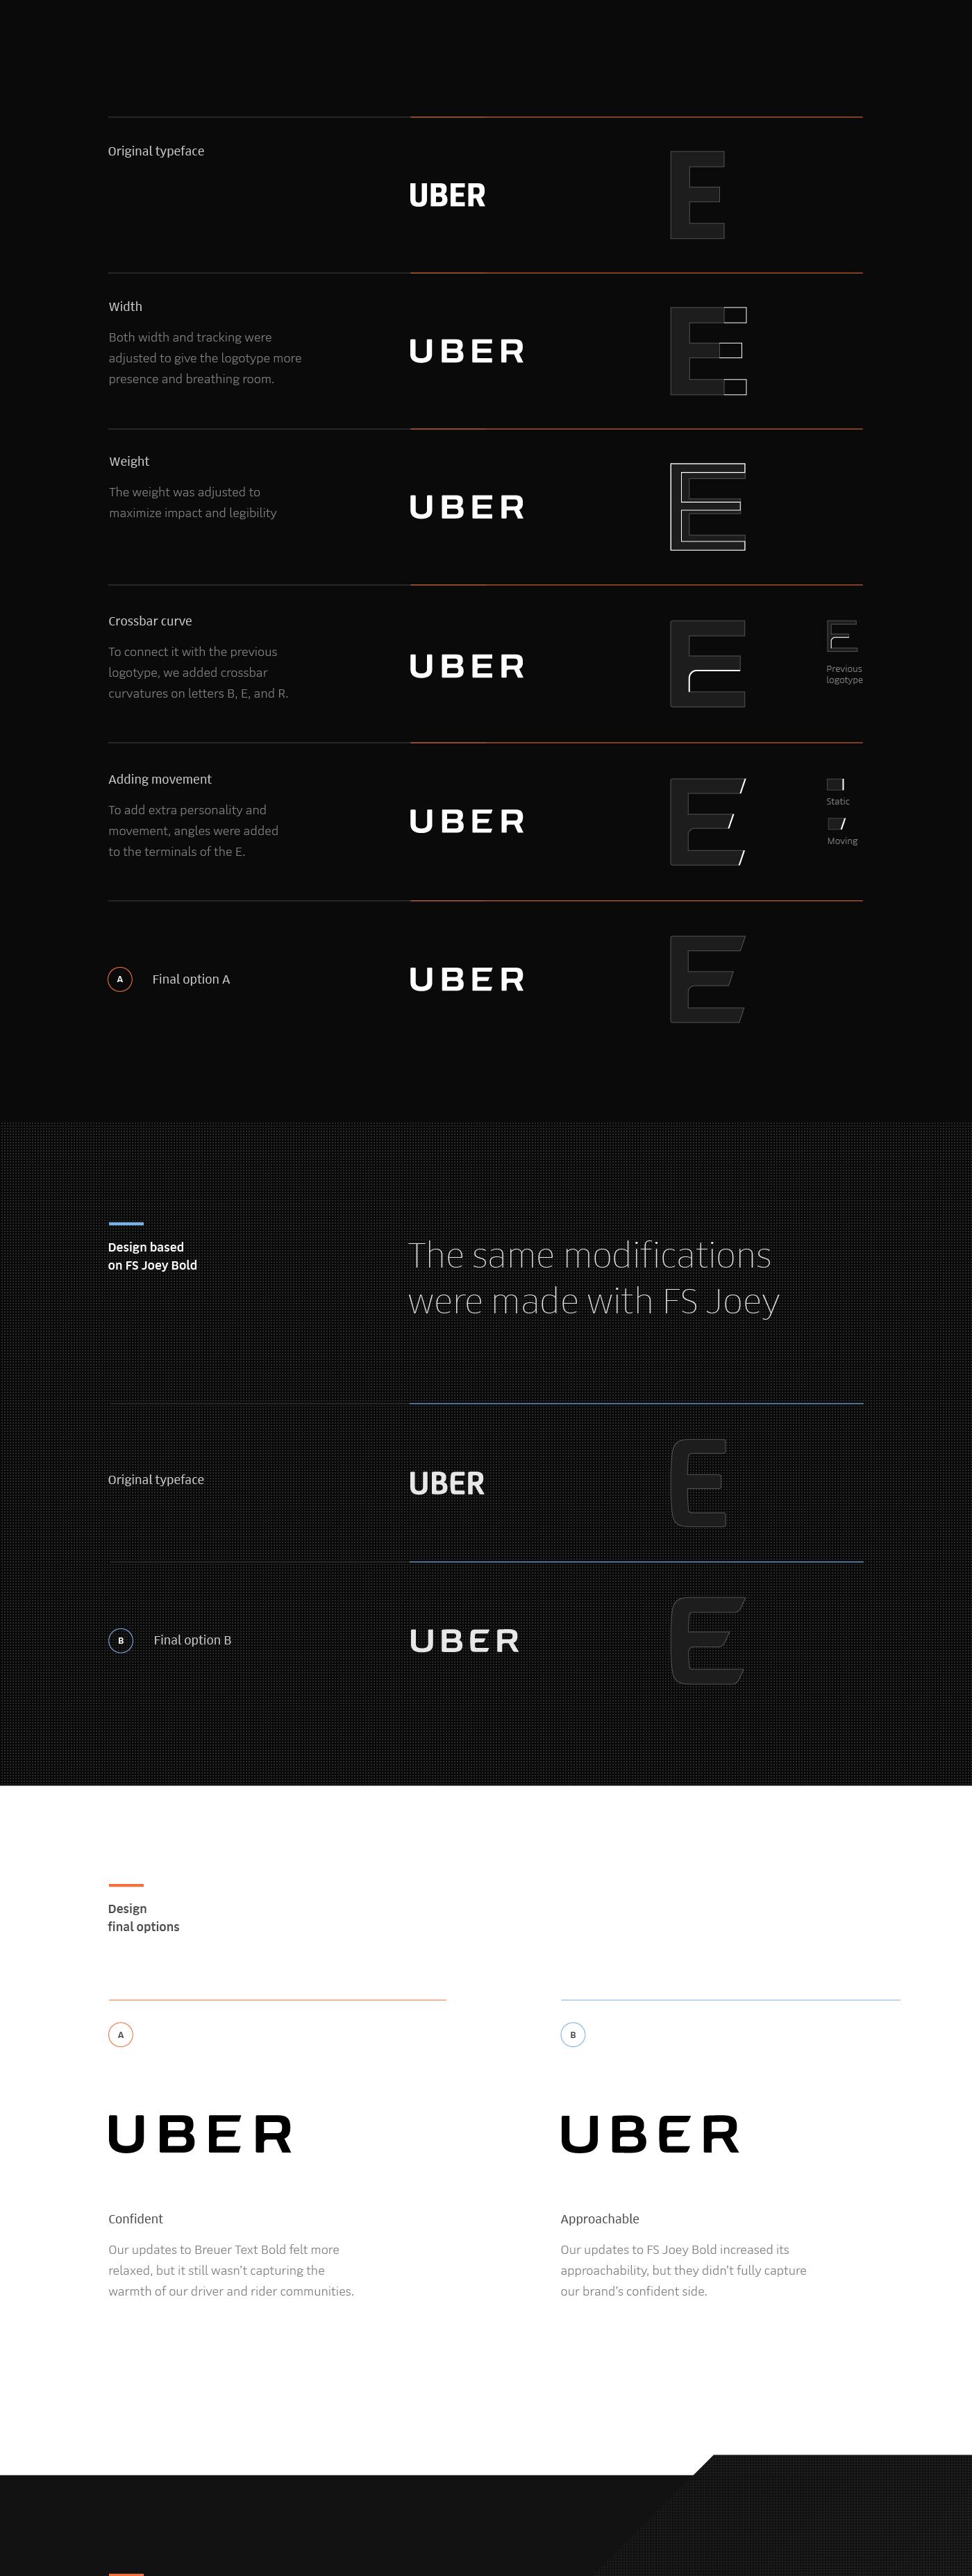 Uber visual identity logotype redesign redesign Design Framework branding  Logotype creative process type